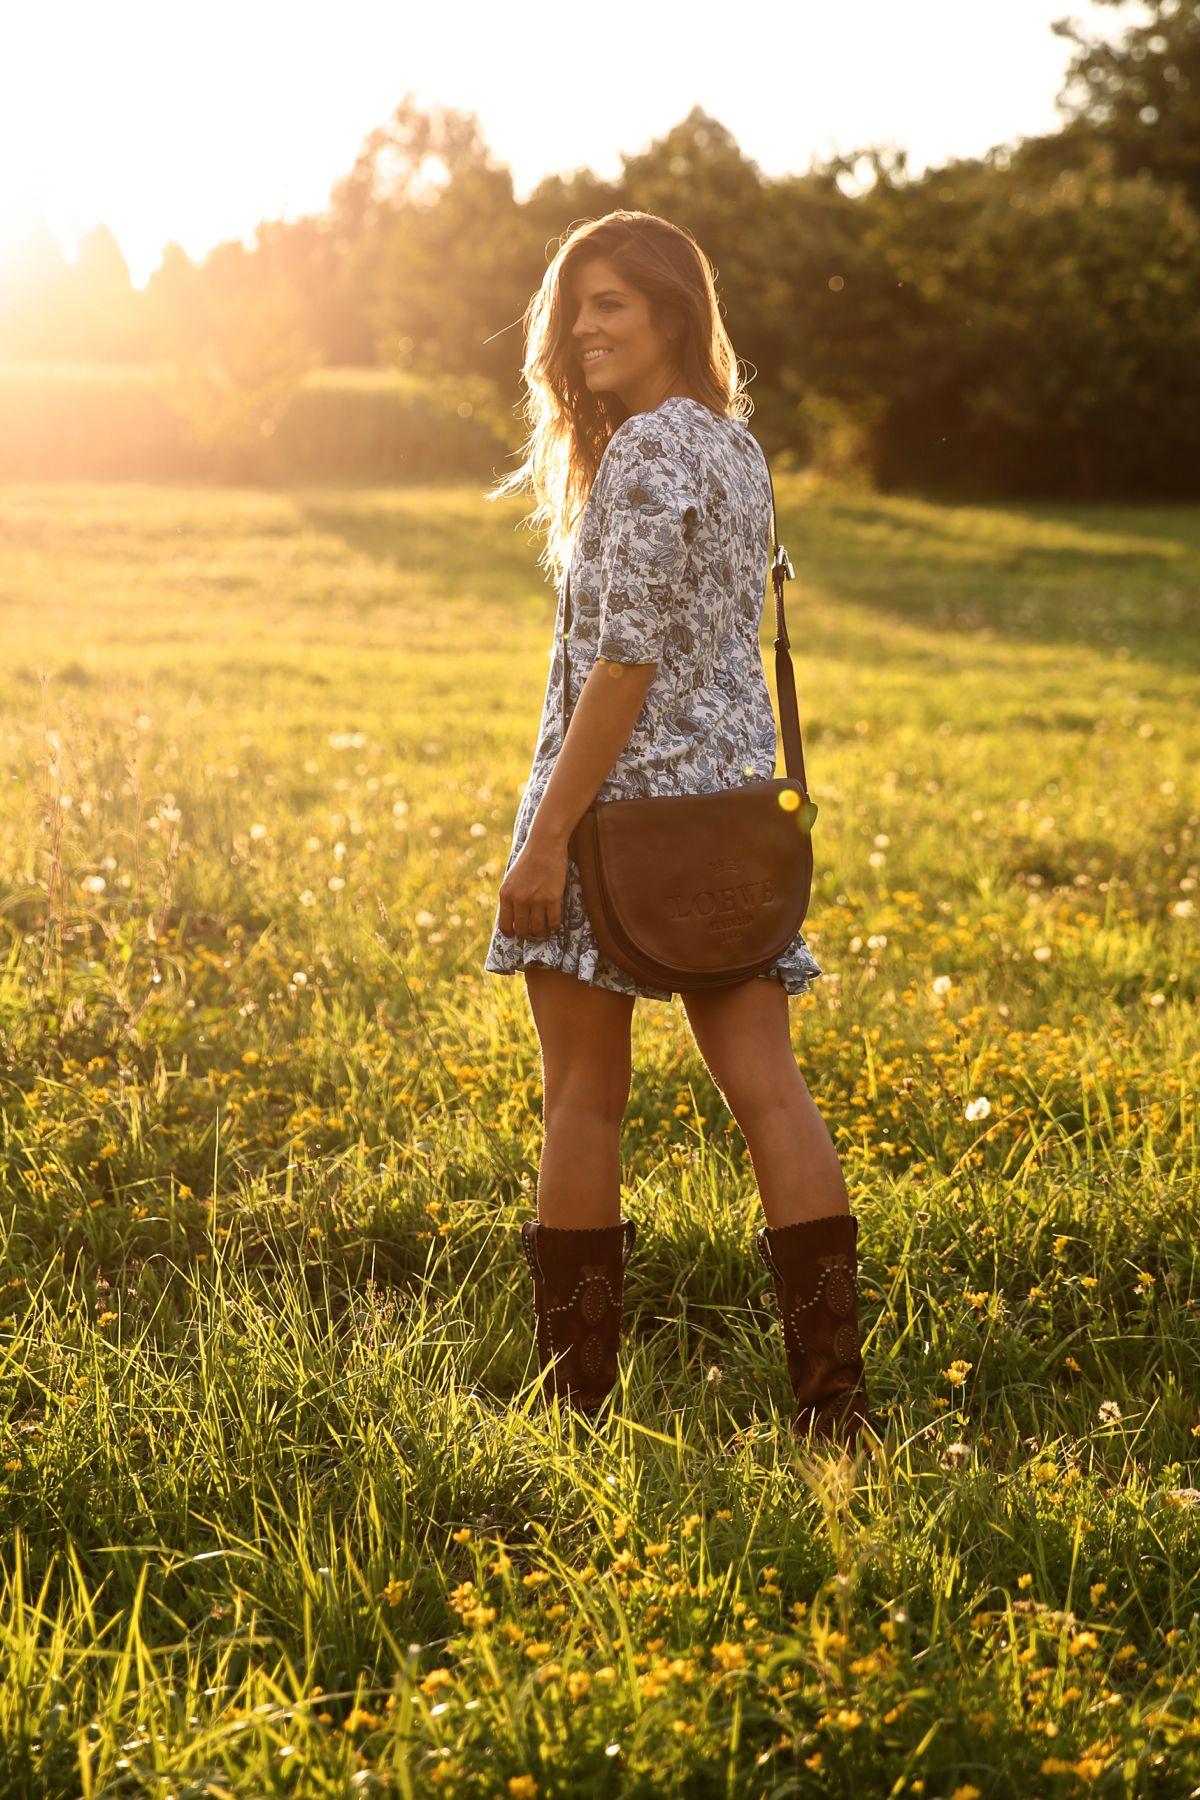 trendy_taste-look-outfit-street_style-ootd-blog-blogger-fashion_spain-moda_españa-cowboy-campero-sendra-cowboy_boots-botas_camperas-loewe-bag-bolso-vestido_flores-flower_print-dress-12